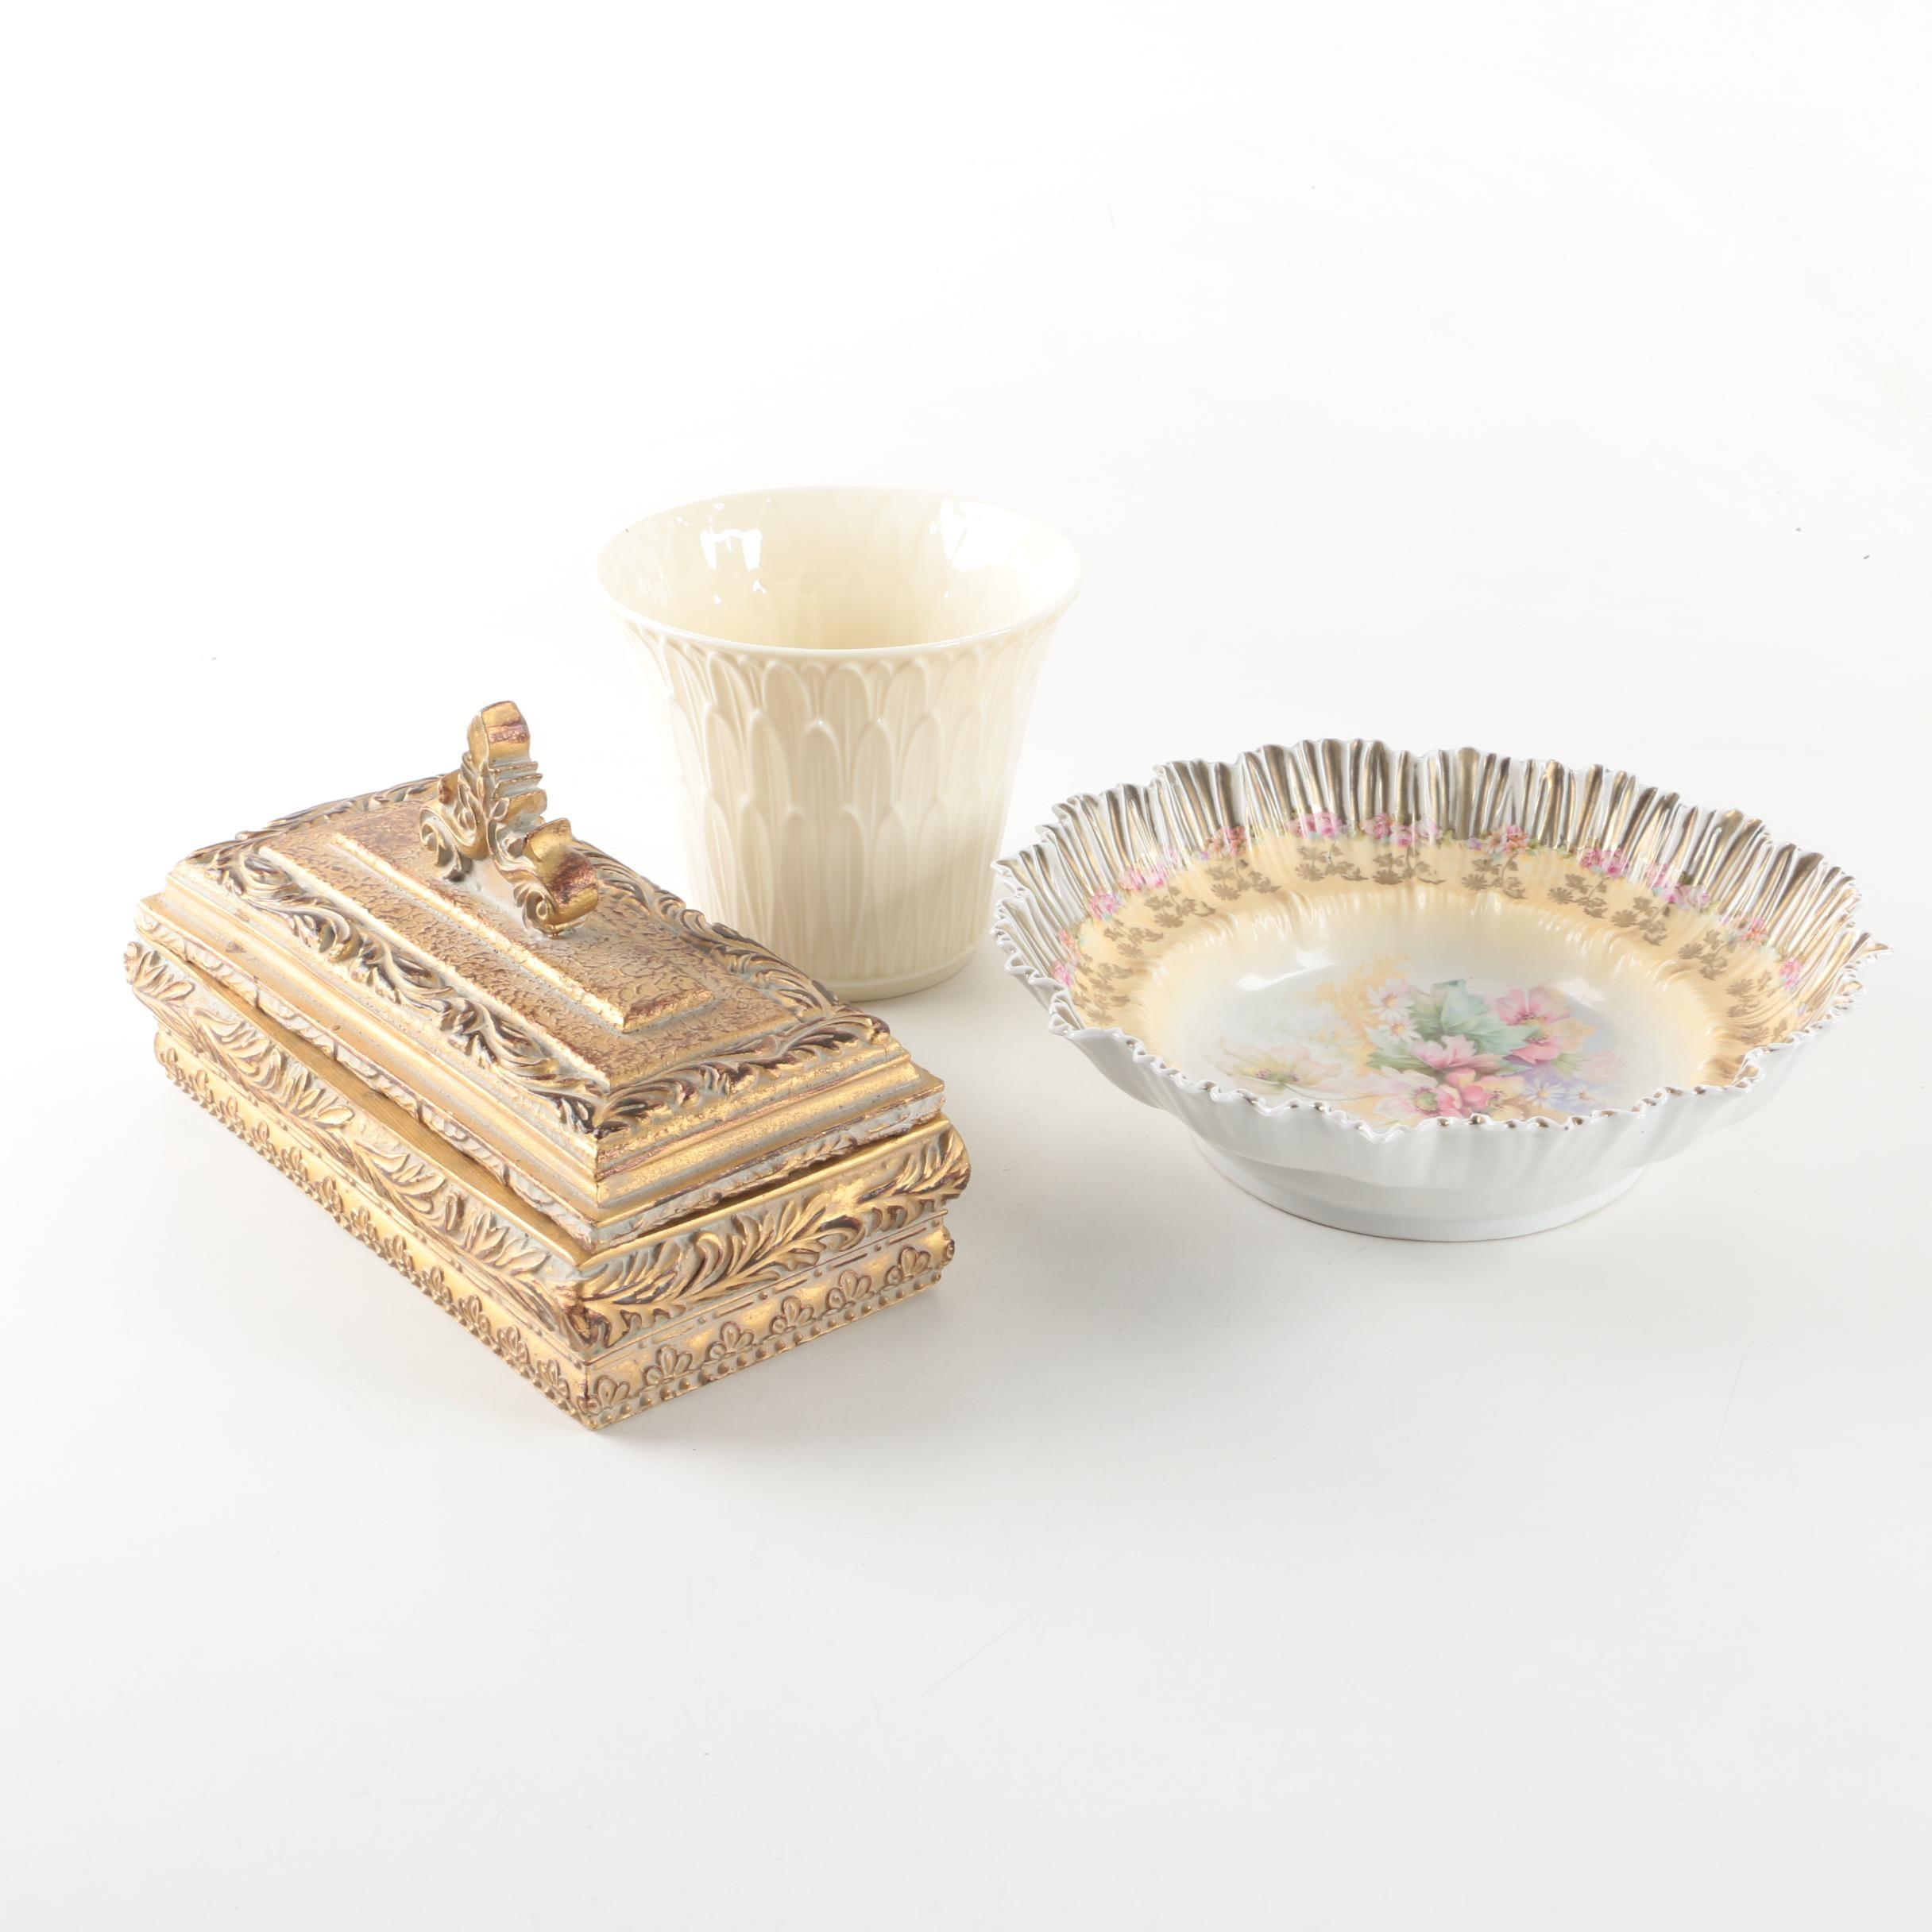 Lenox Florist Vase With a Floral Porcelain Bowl and a Trinket Box